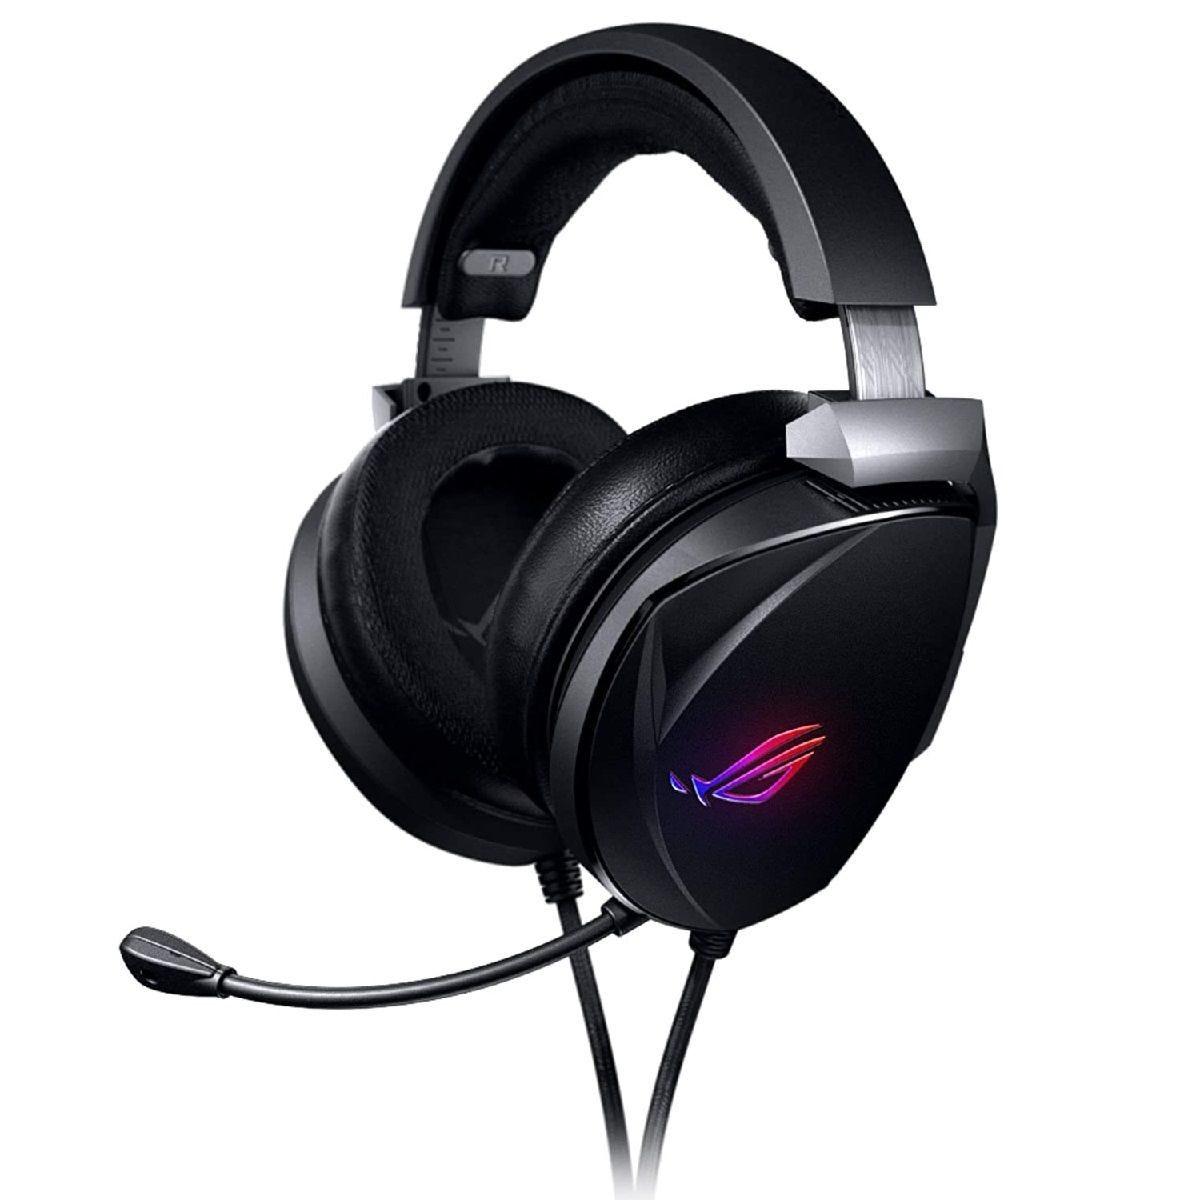 ASUS ROG Theta USB-C Gaming Headset